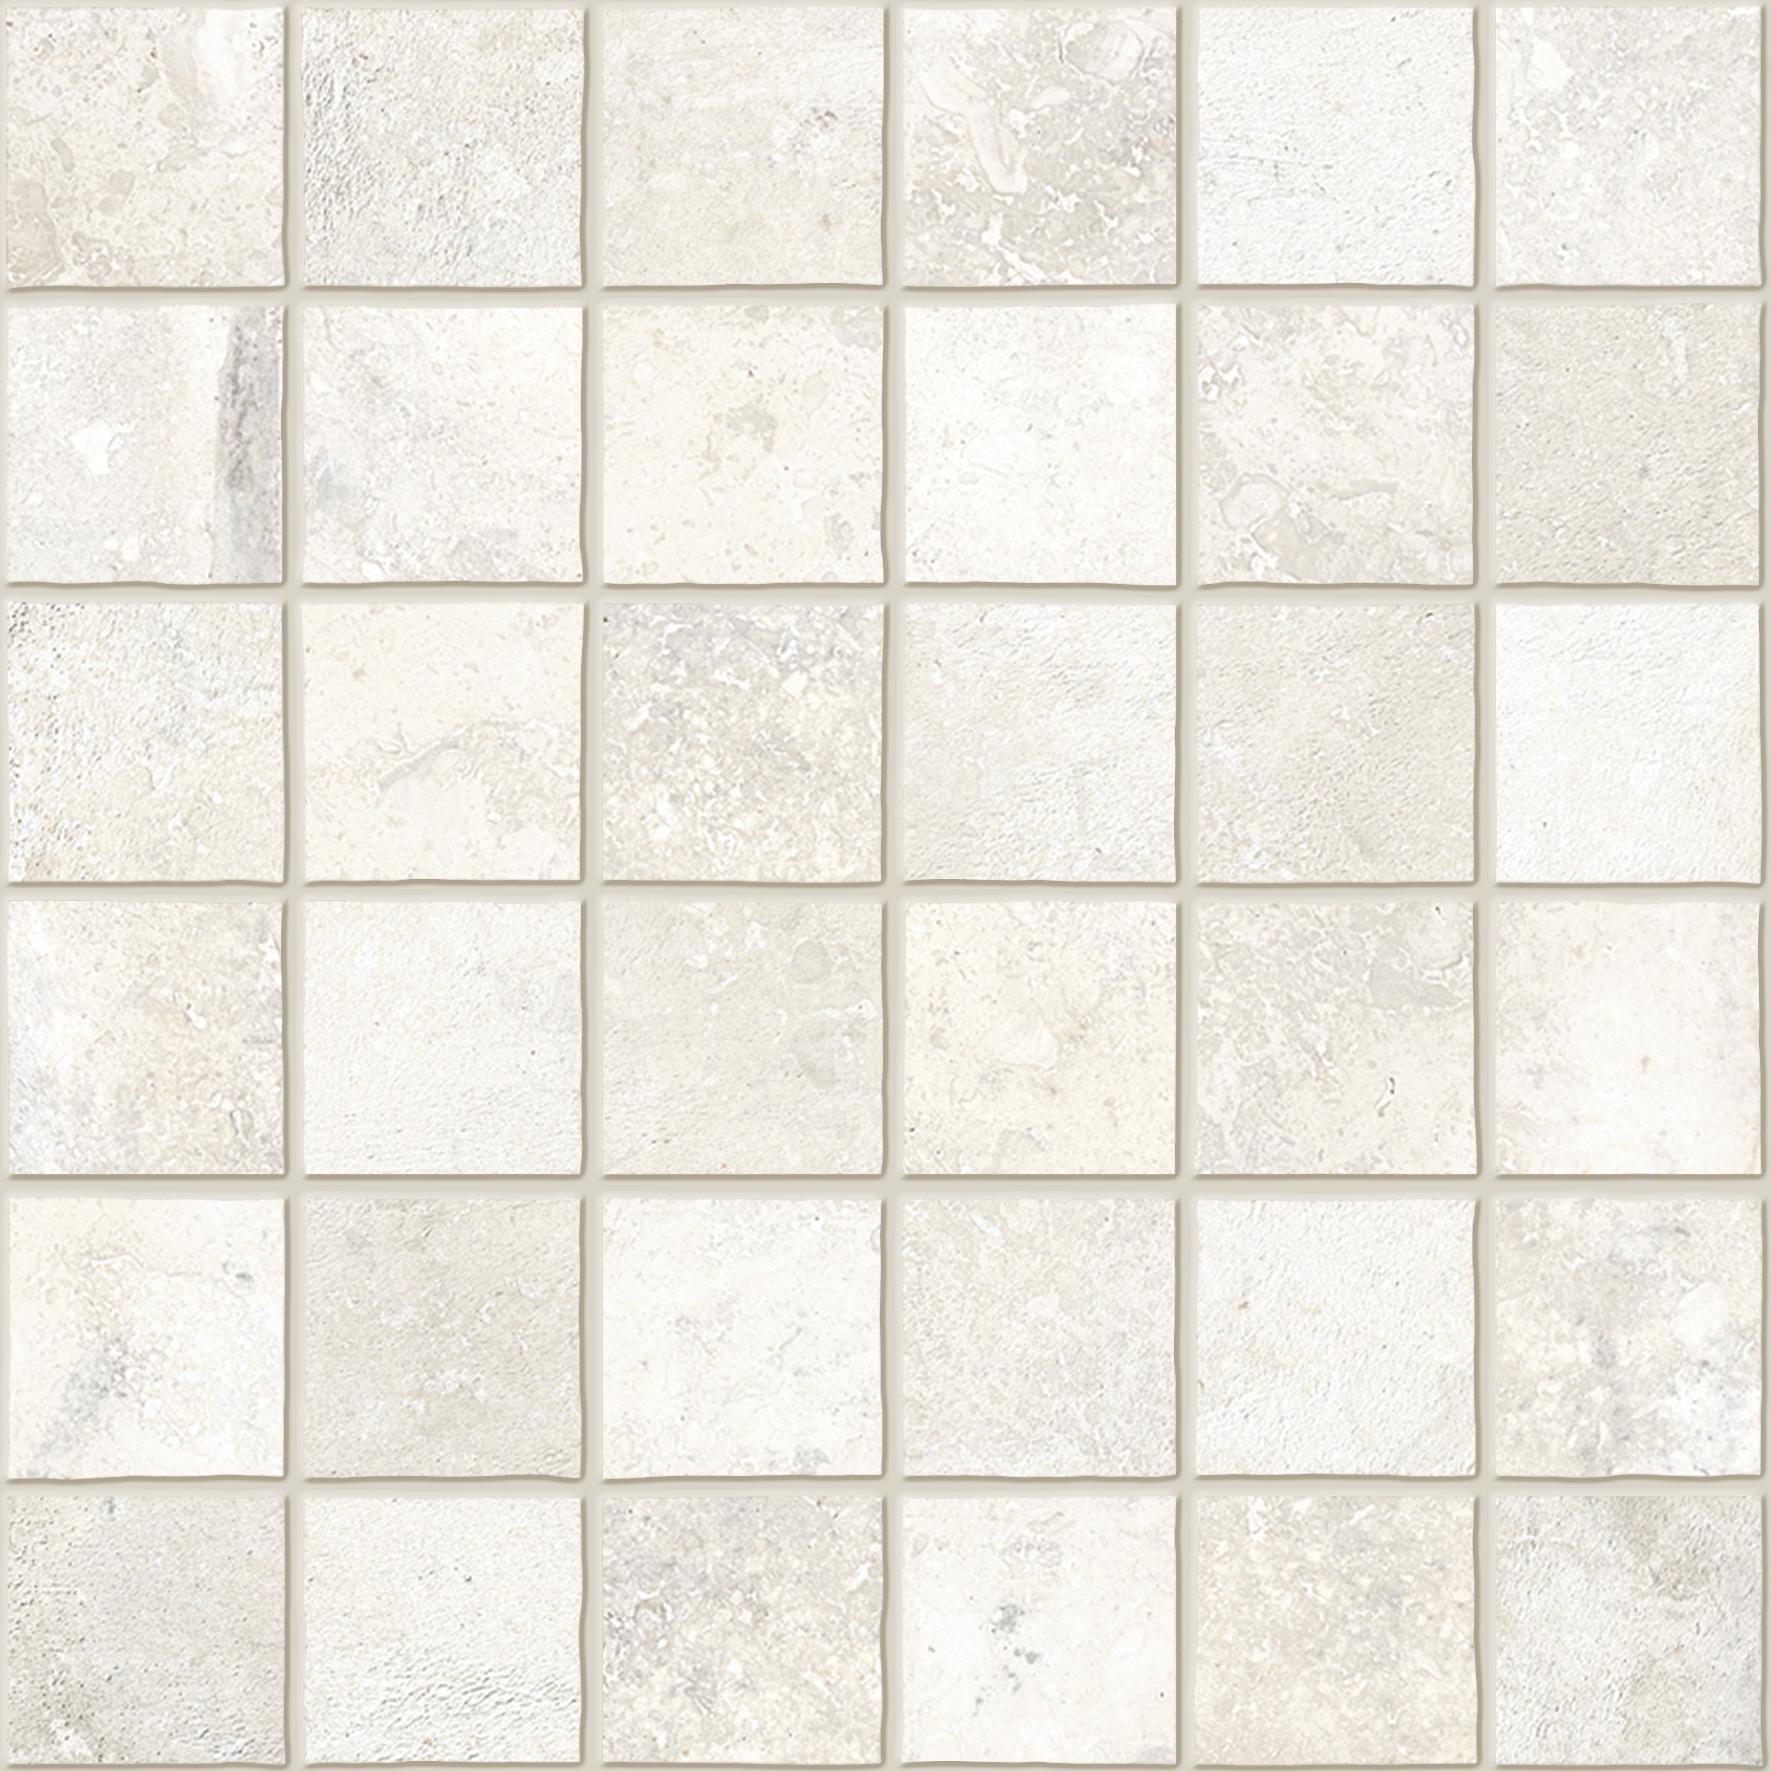 Mosaico Su Rete Burattato Olimpia